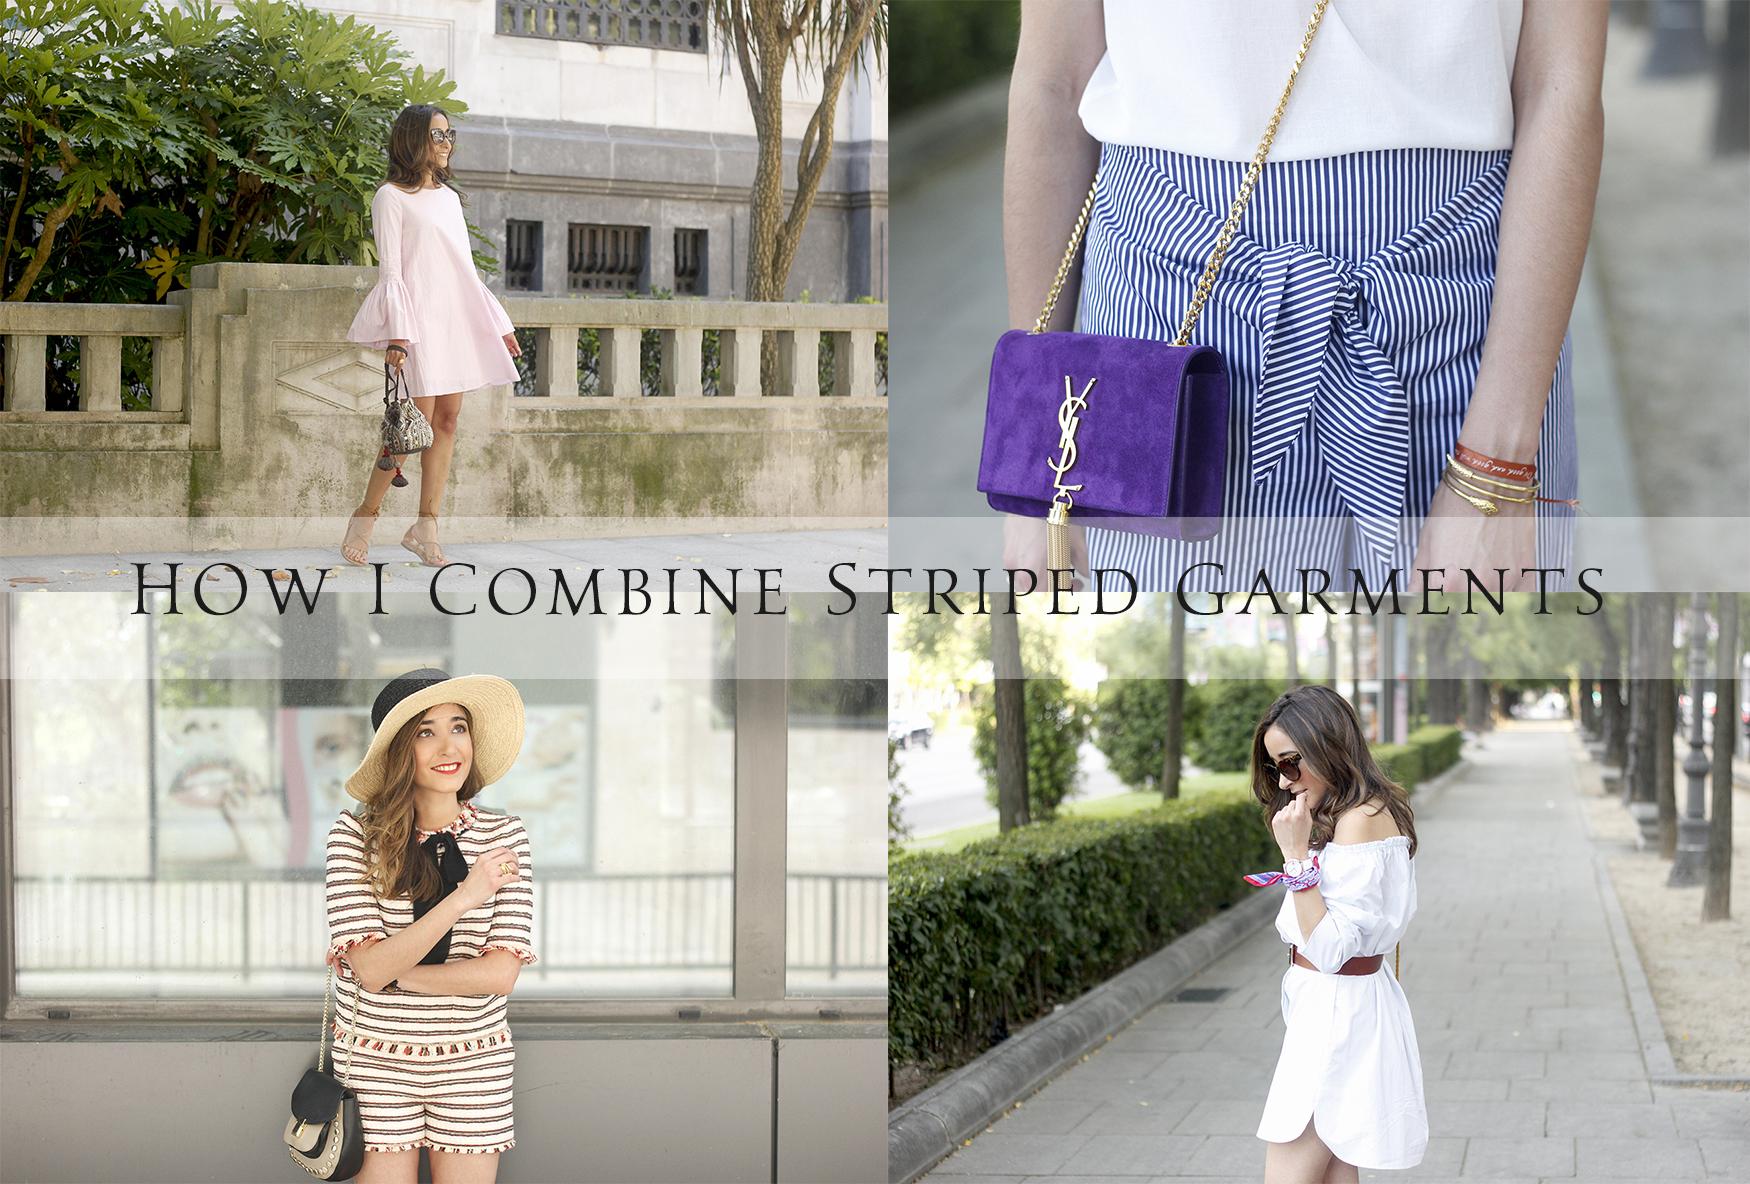 HOw I Combine Striped Garments